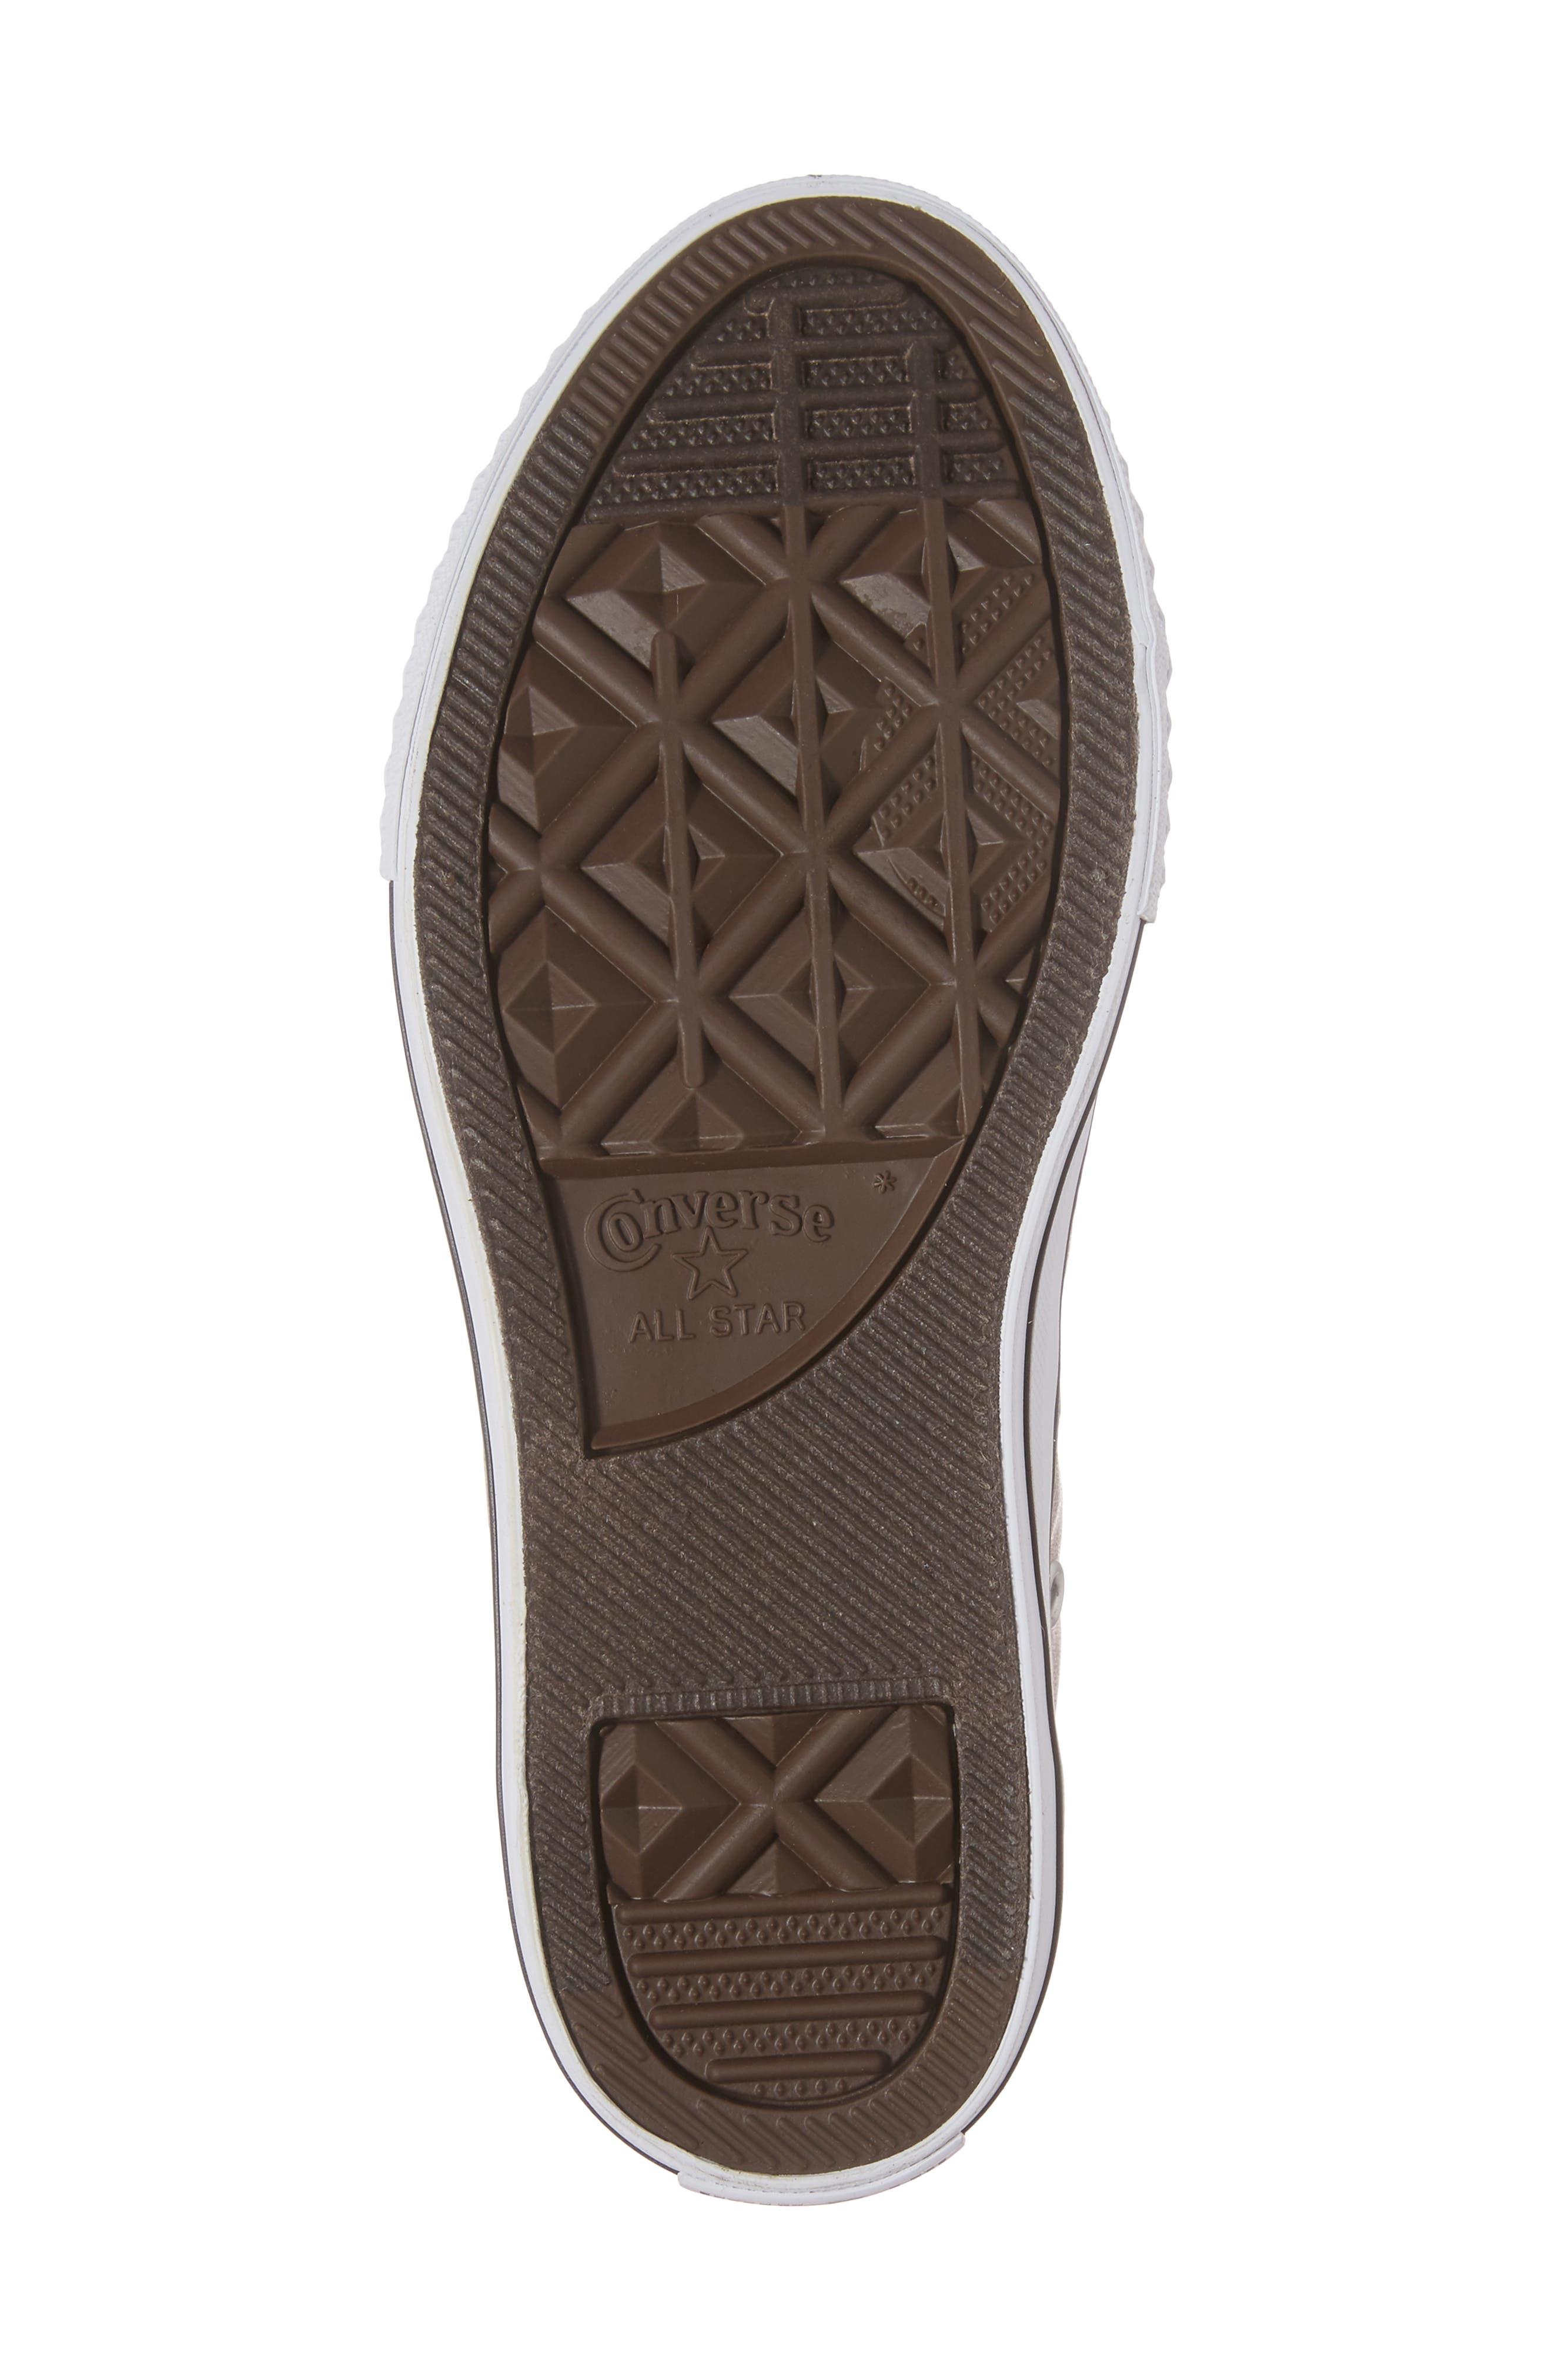 Chuck Taylor<sup>®</sup> All Star<sup>®</sup> Seasonal Metallic High Top Sneaker,                             Alternate thumbnail 6, color,                             221